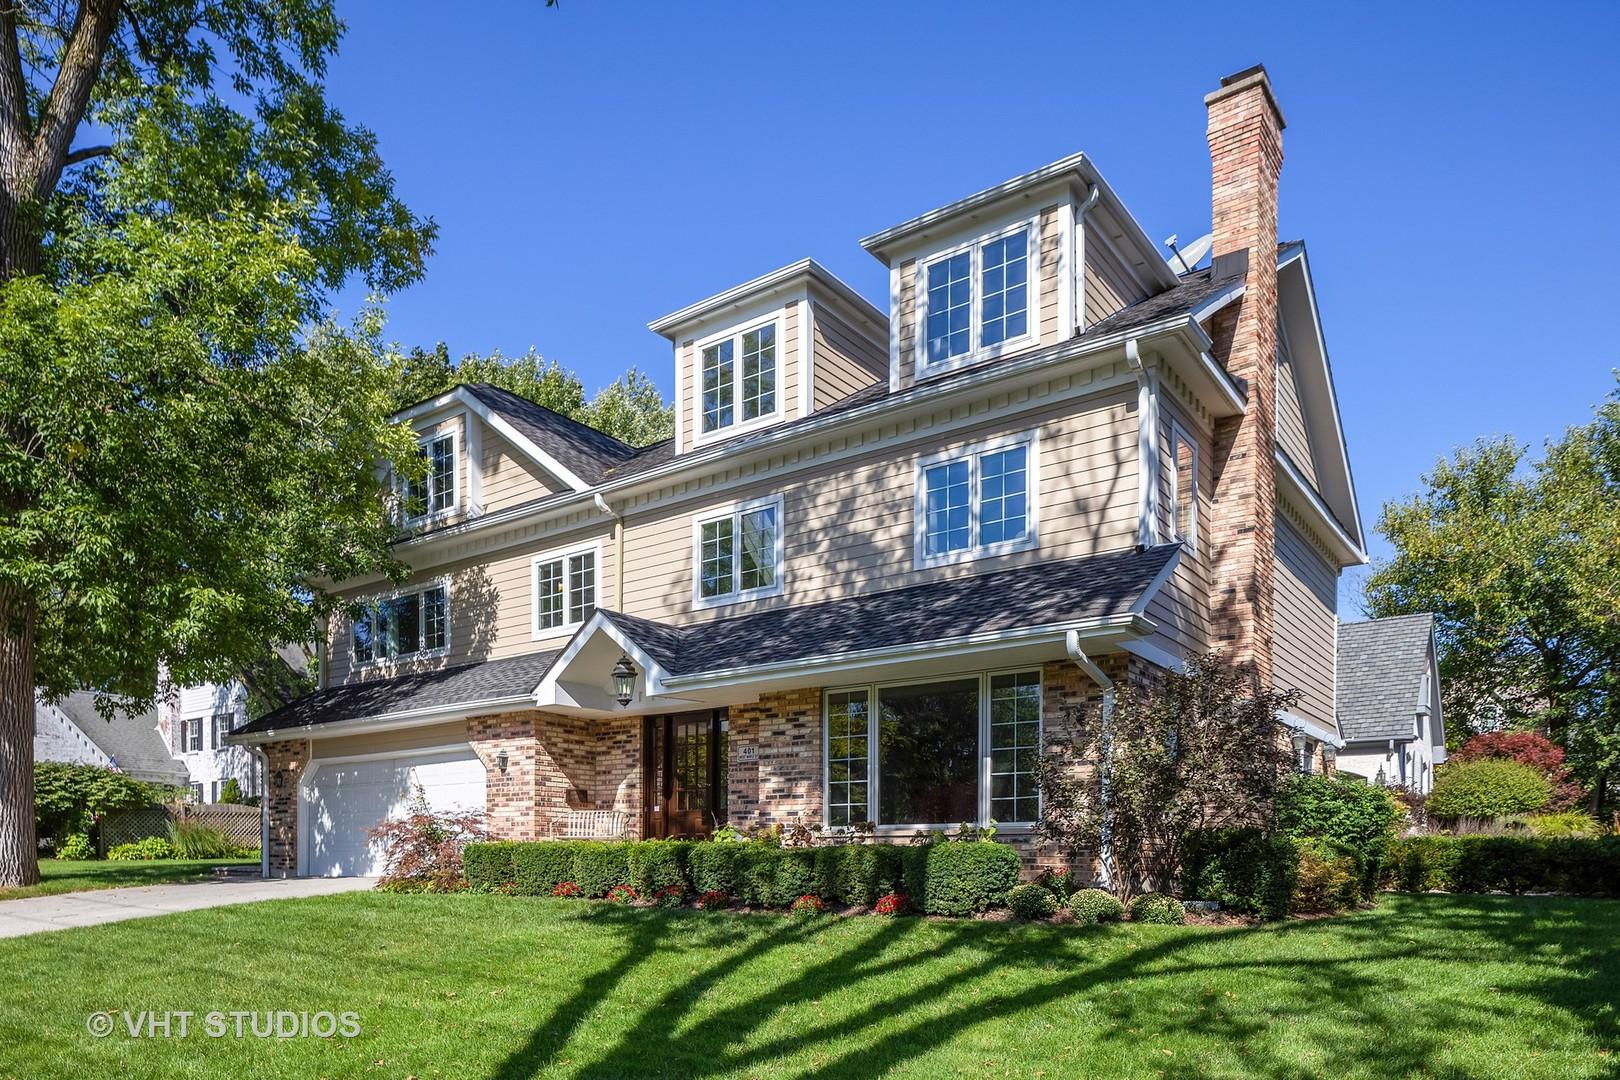 401 West Maple, Hinsdale, Illinois, 60521